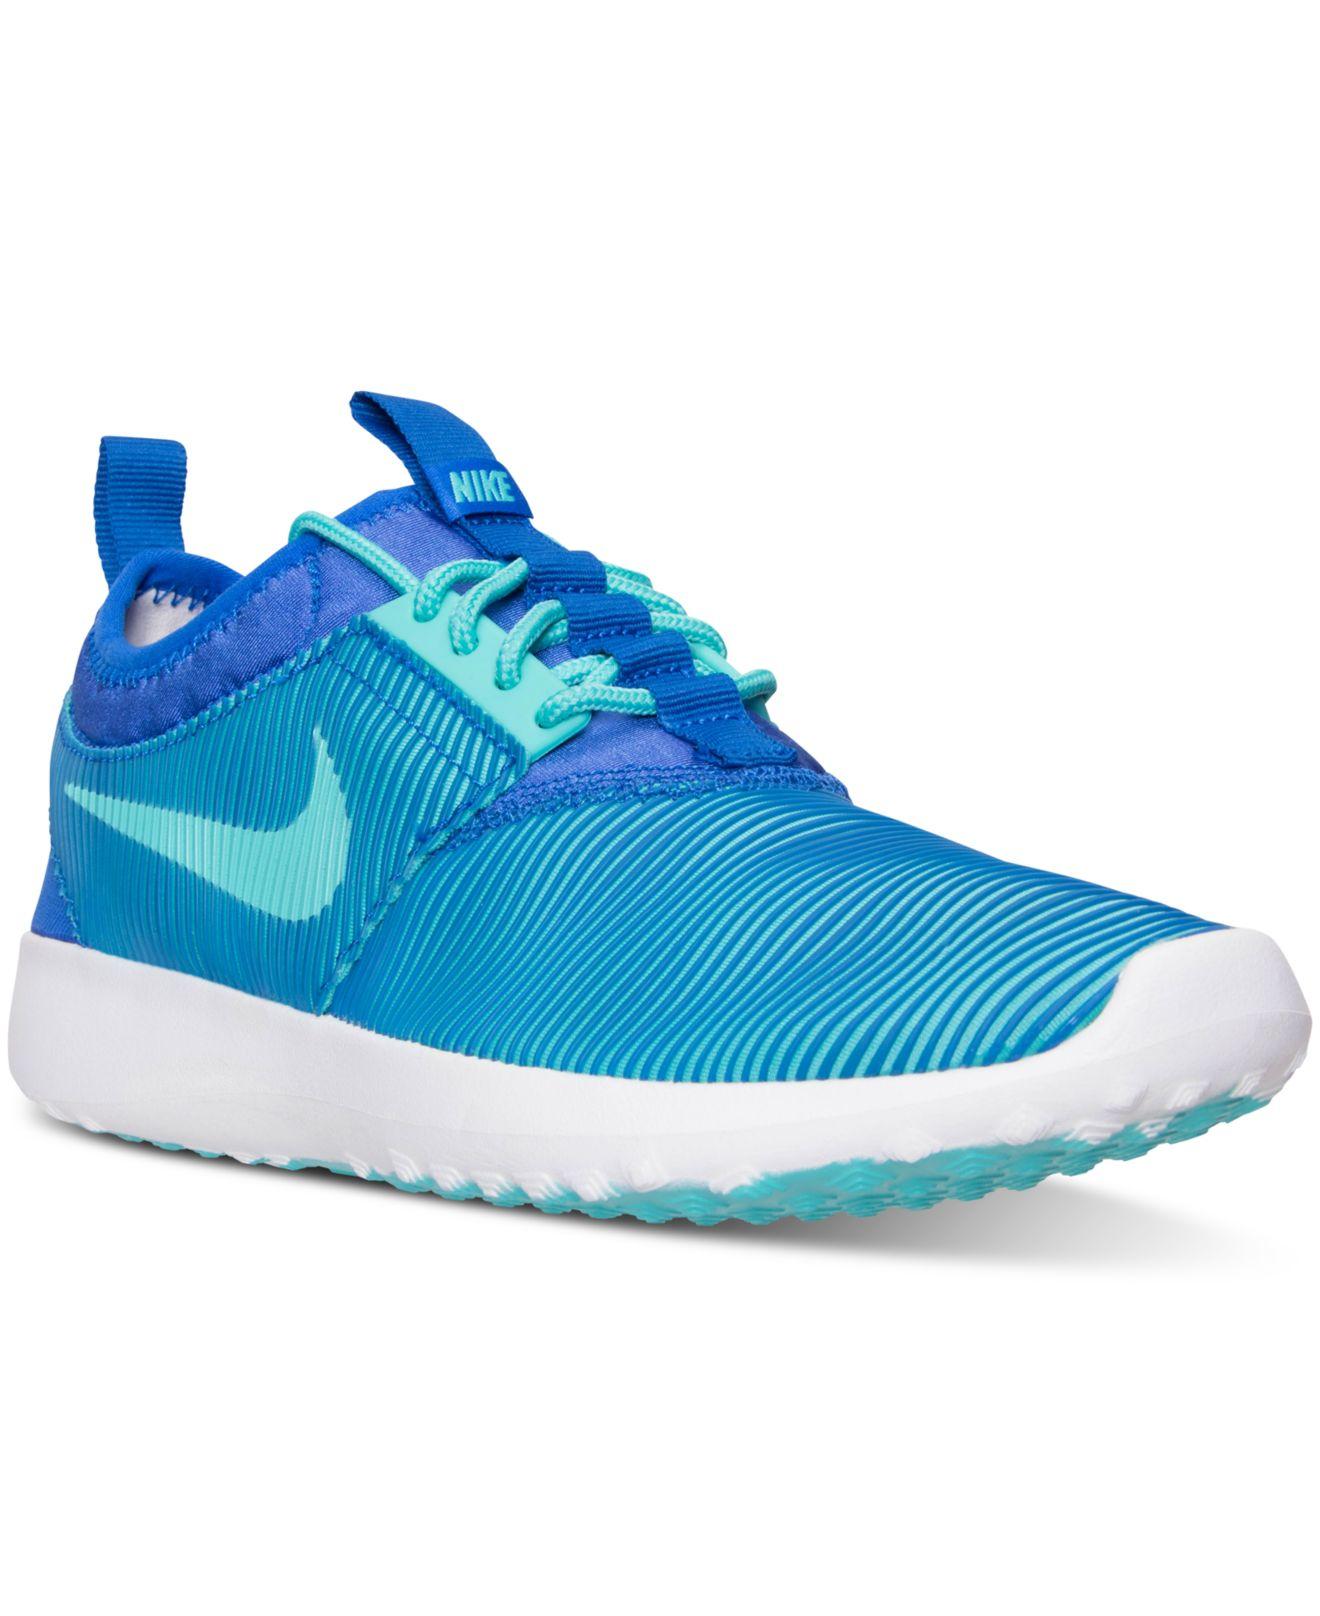 online retailer 3fbf8 b741e Lyst - Nike Women s Juvenate Sm Casual Sneakers From Finish Line in Blue